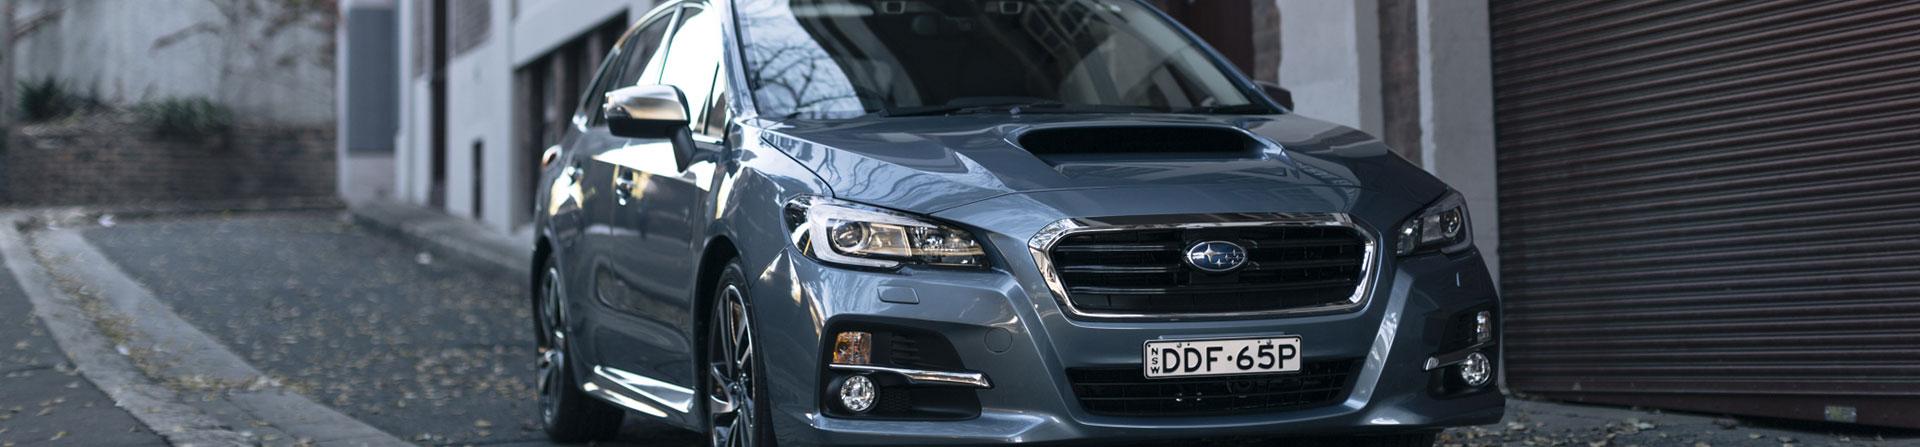 Subaru Levorg Image 0